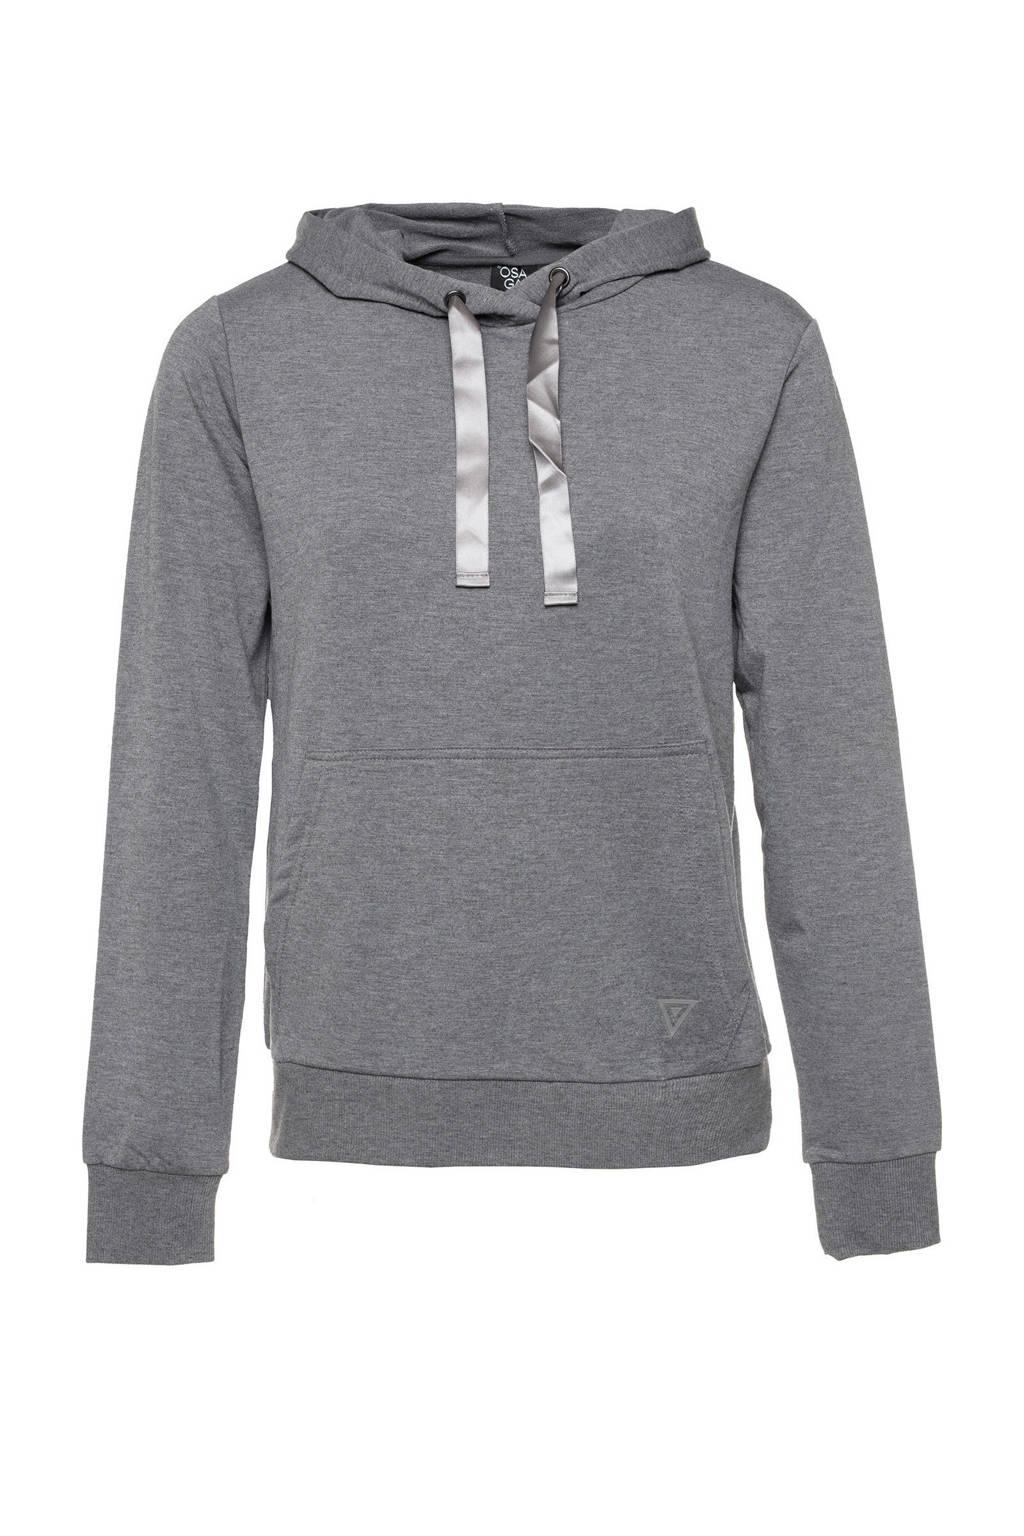 Scapino Osaga sportsweater grijs melange, Grijs